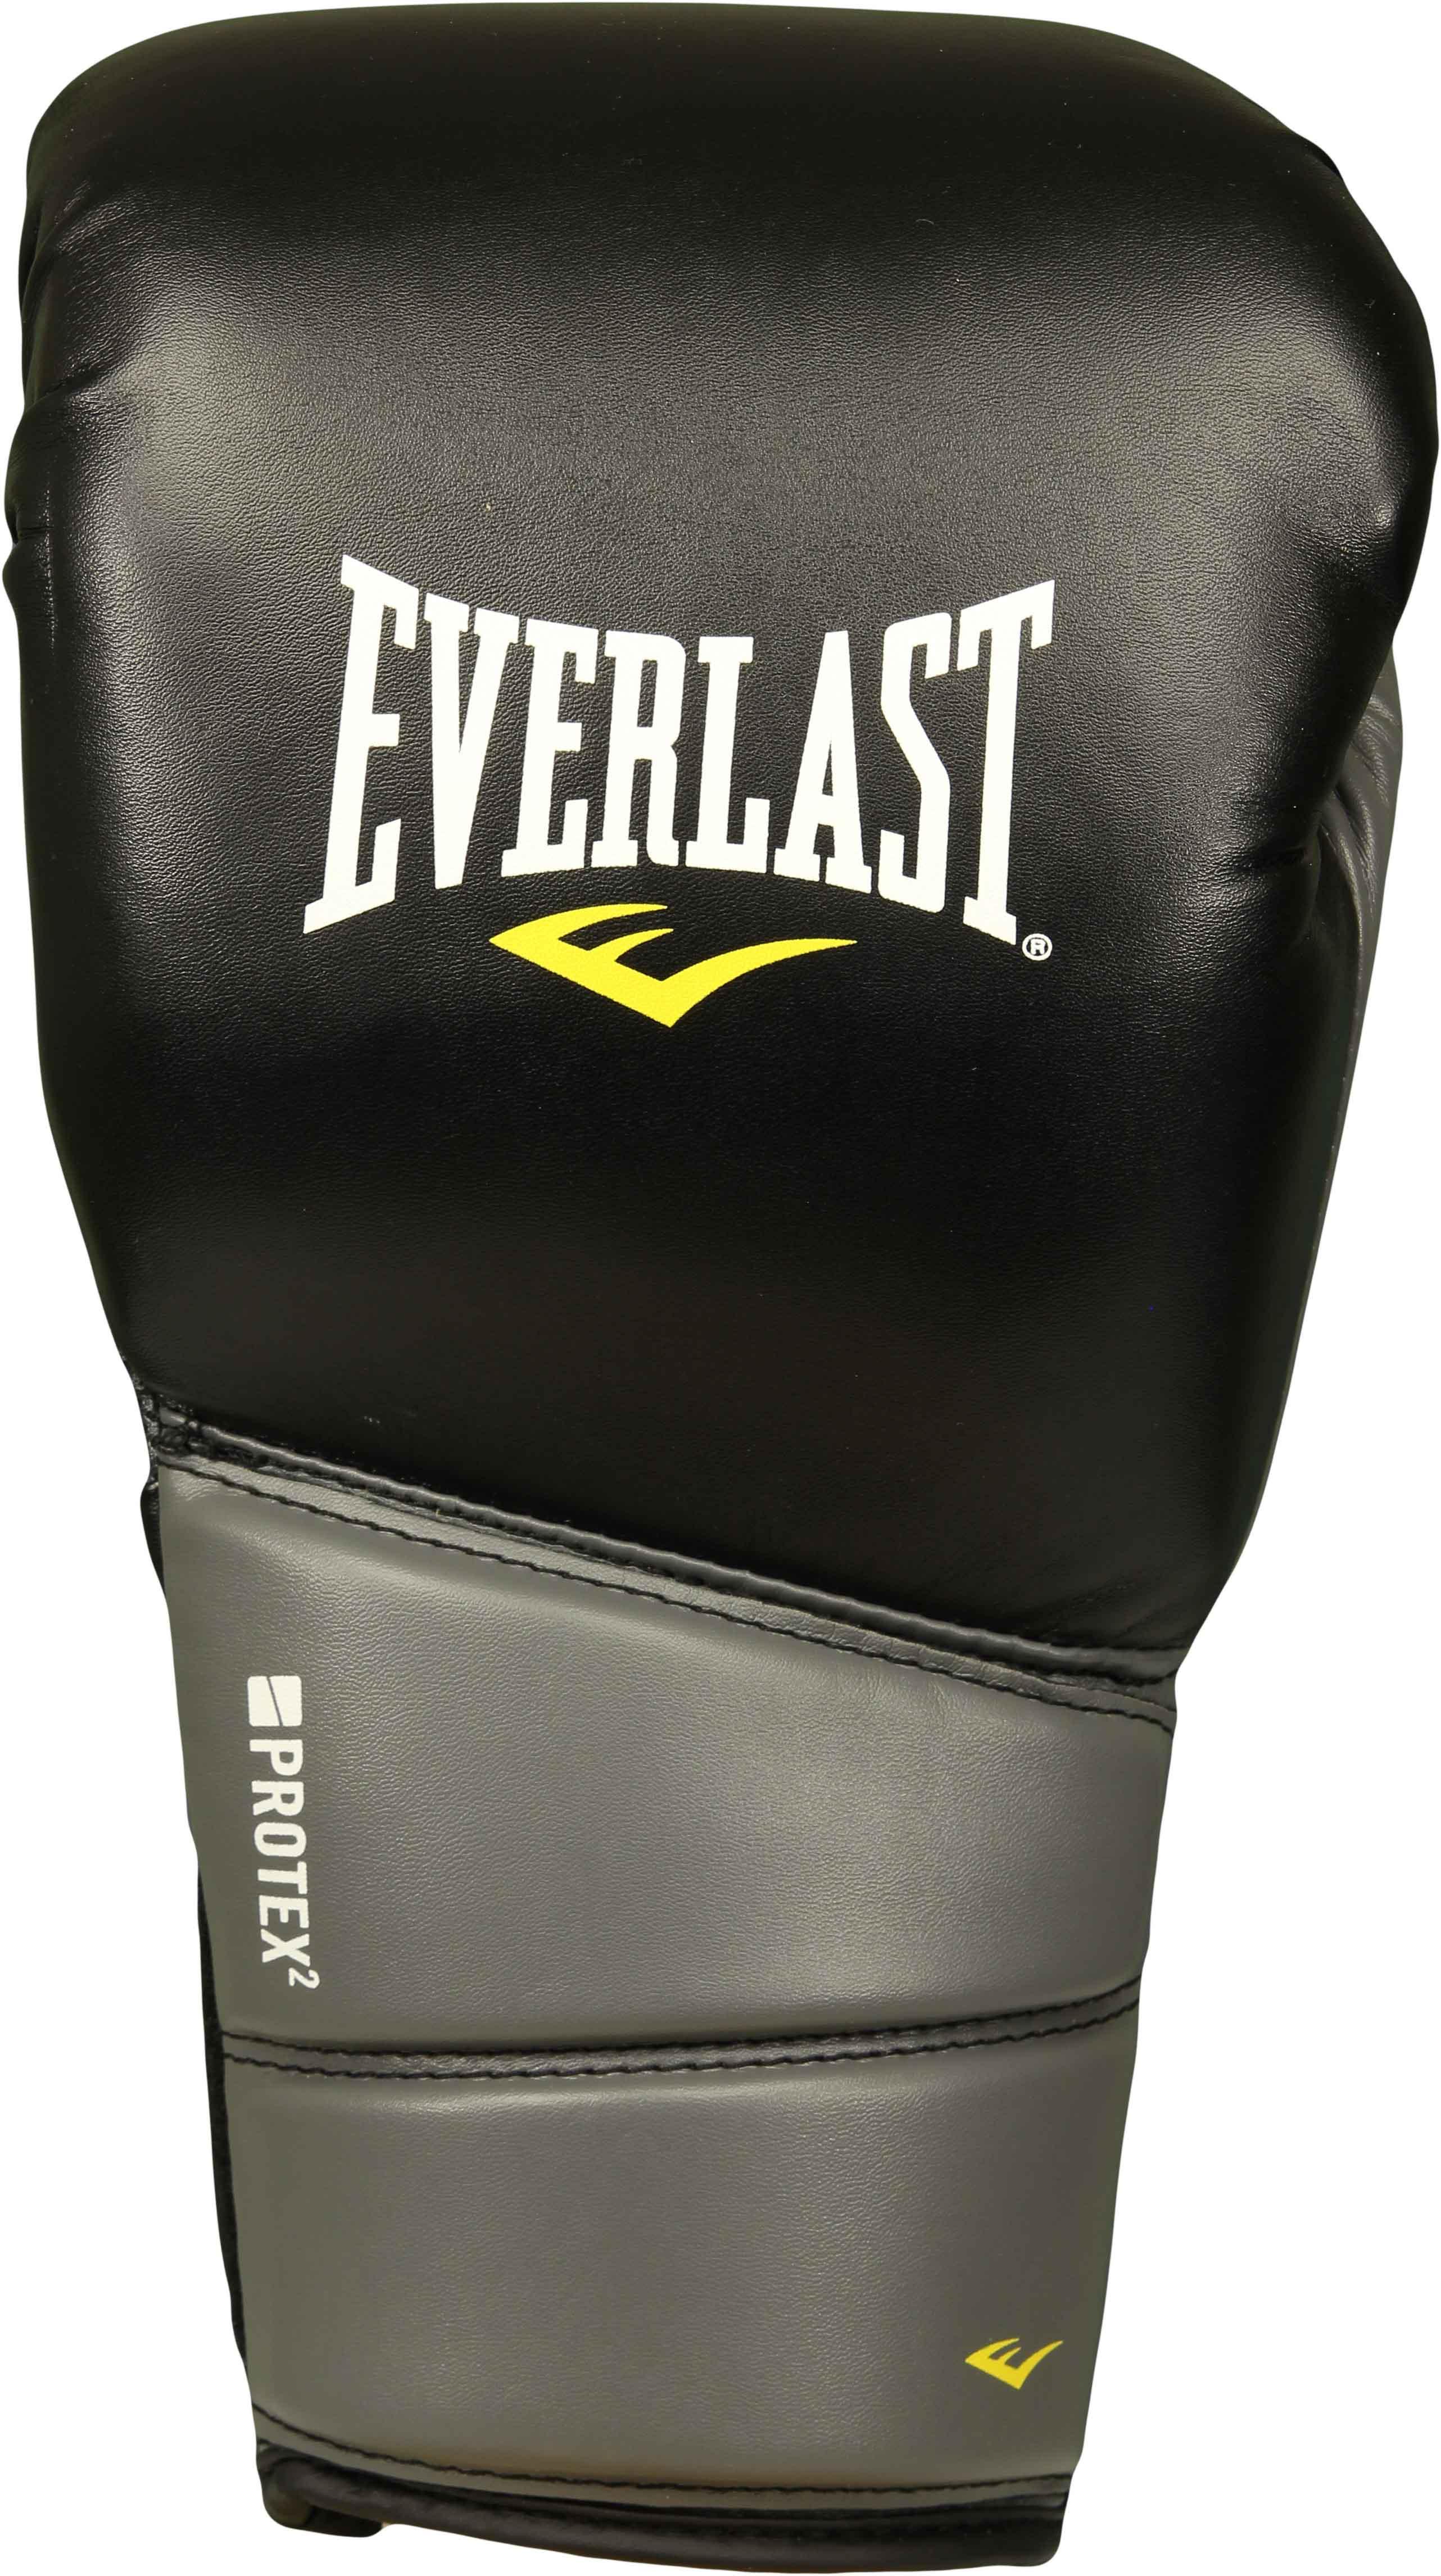 Shiv Naresh Teens Boxing Gloves 12oz: Everlast Gel Protex 2 Boxing Gloves (Black/Gray)